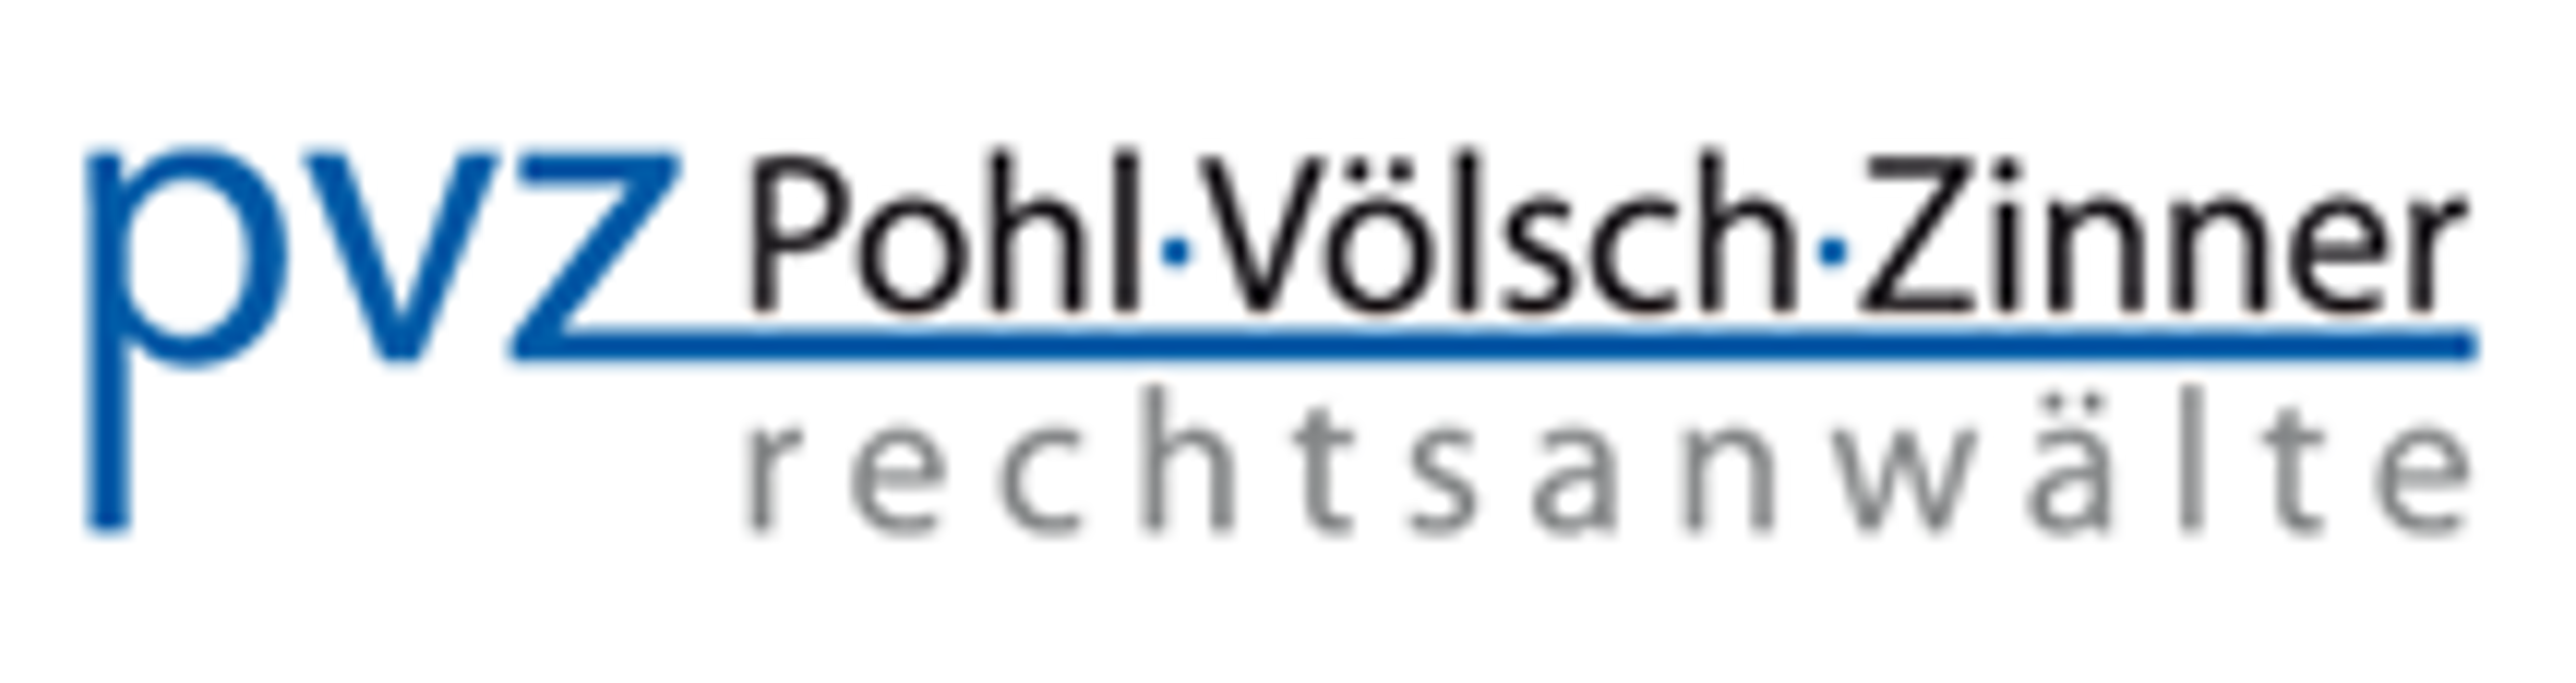 Bild zu PVZ Pohl, Völsch, Zinner Rechtsanwälte in Kaufbeuren